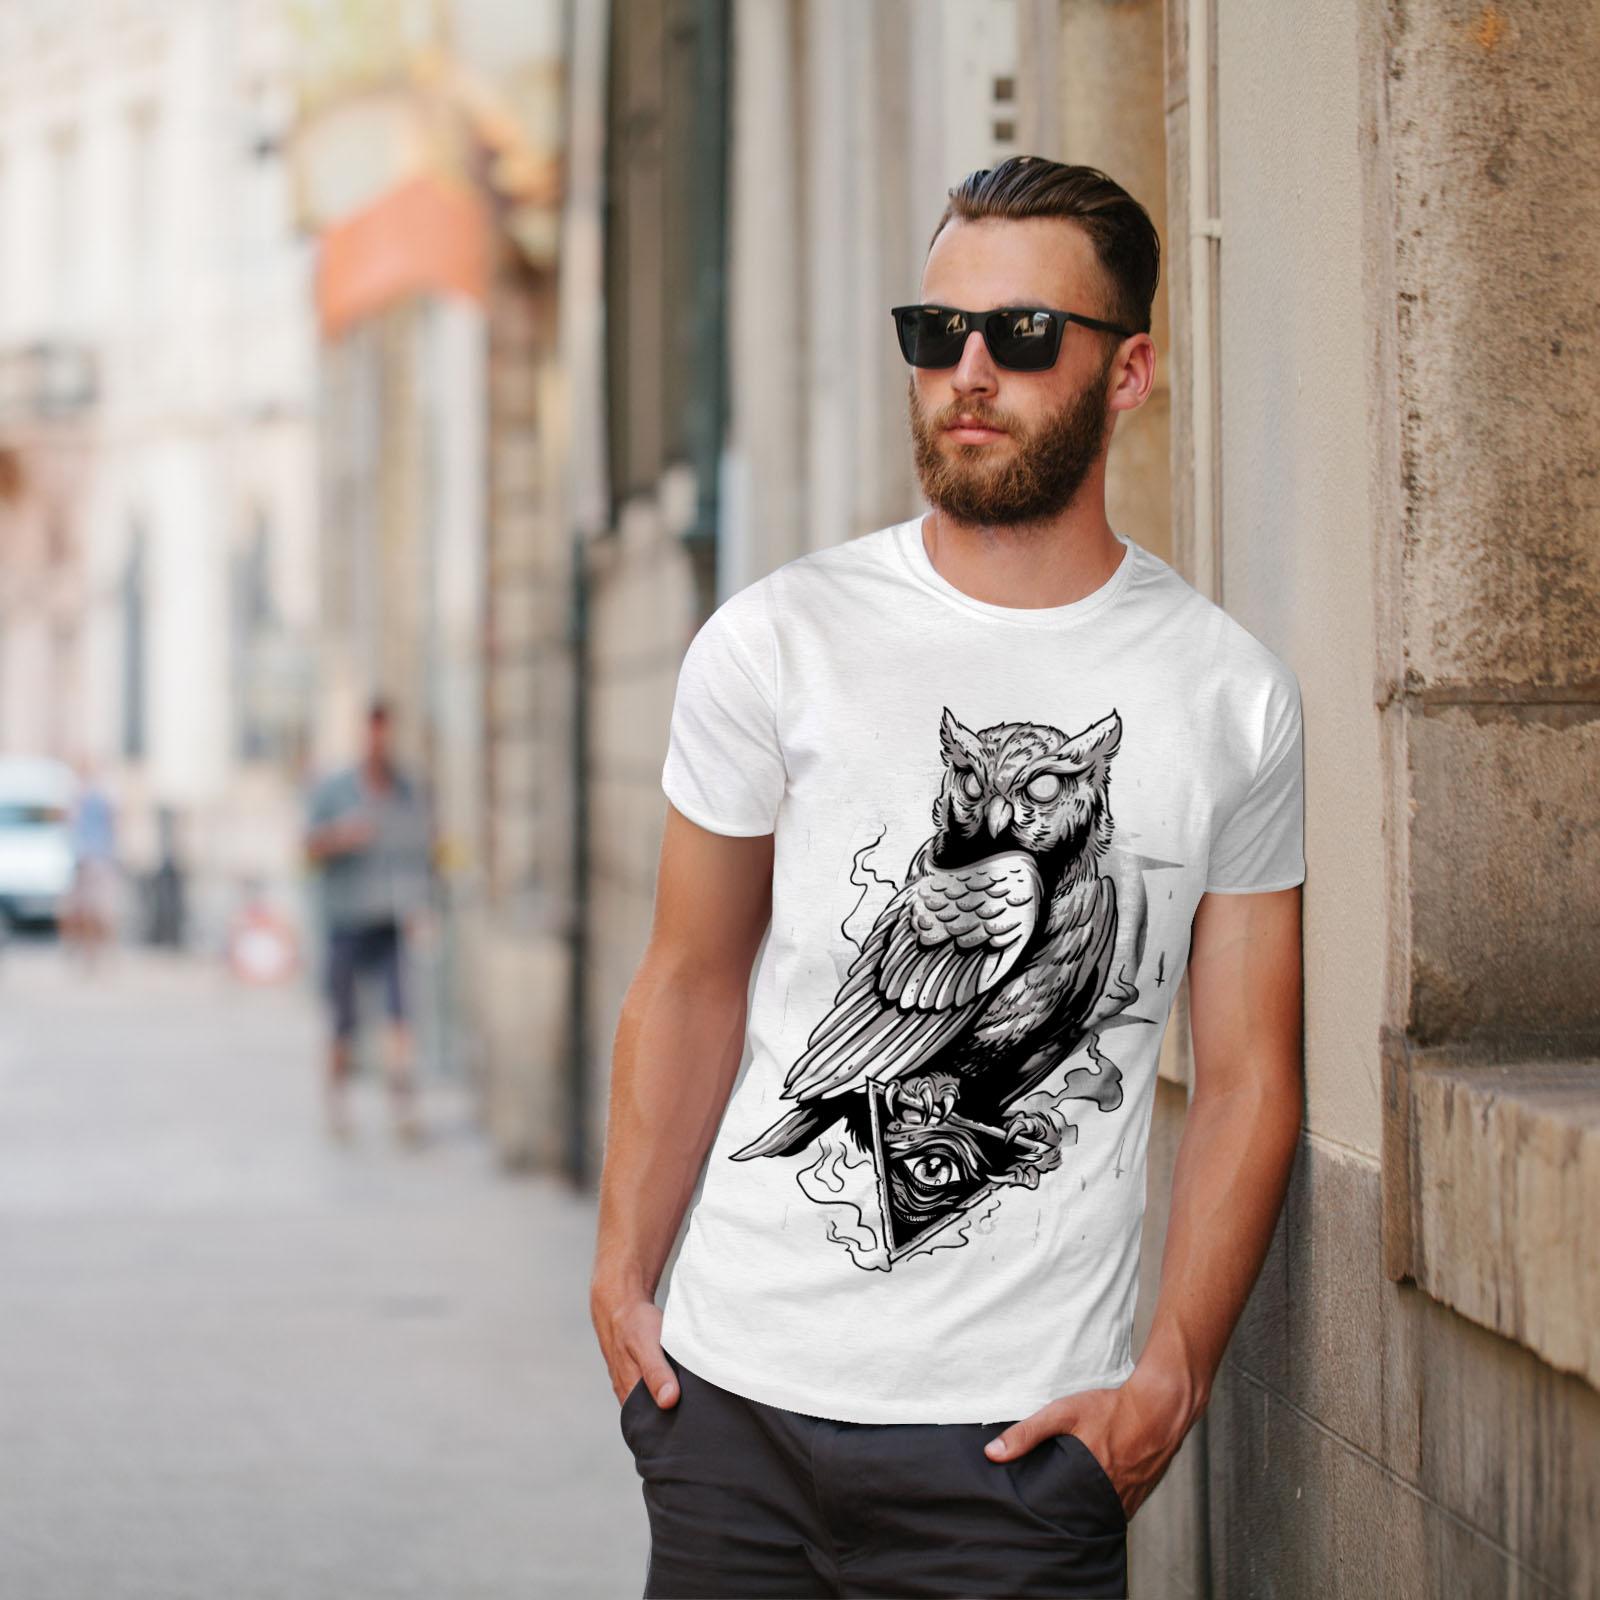 miniature 11 - Wellcoda Triangle Owl Mens T-shirt, Conspiracy Graphic Design Printed Tee